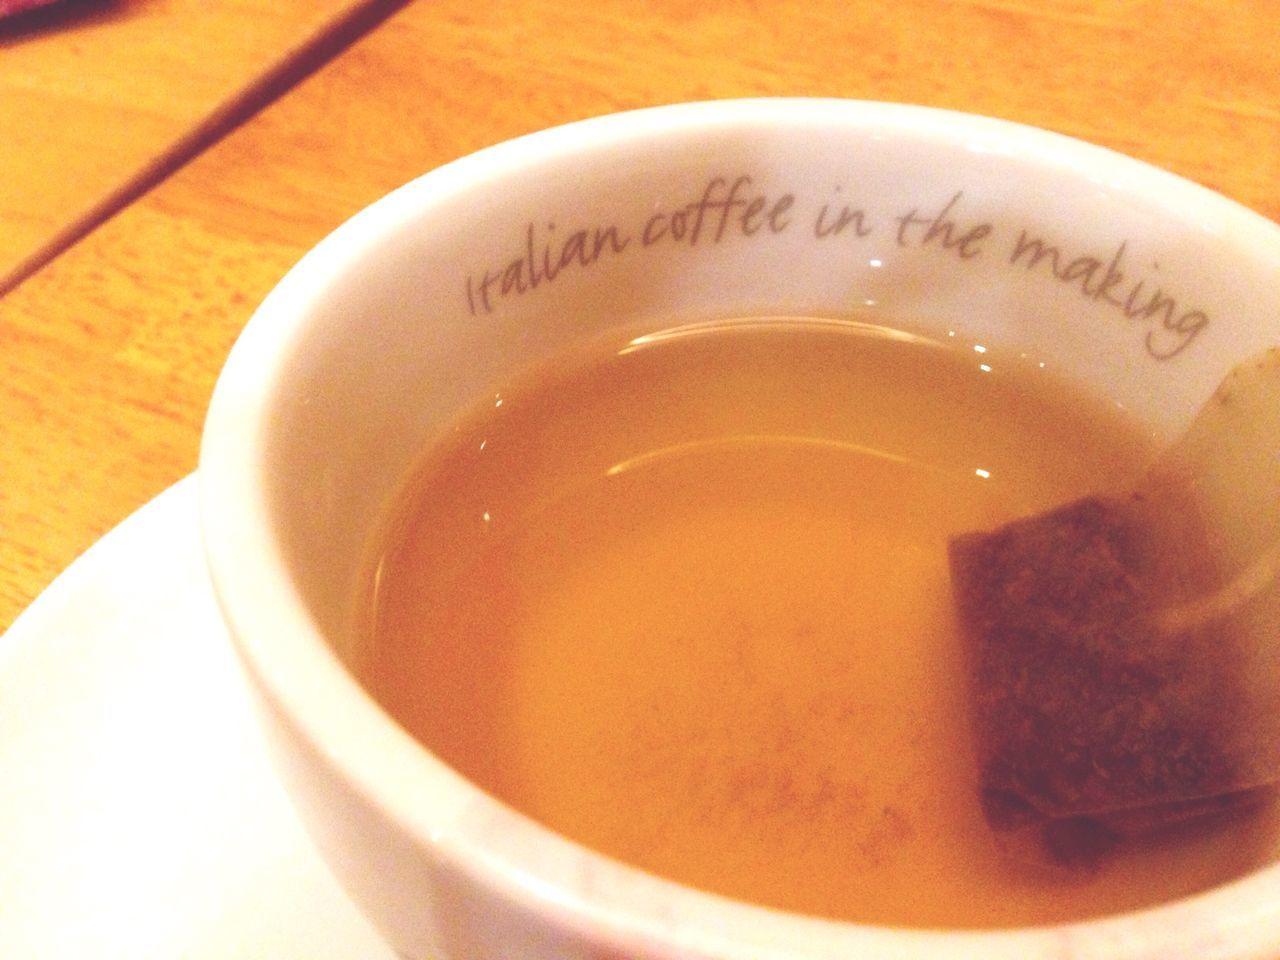 Having a Cup of green tea ... Tea